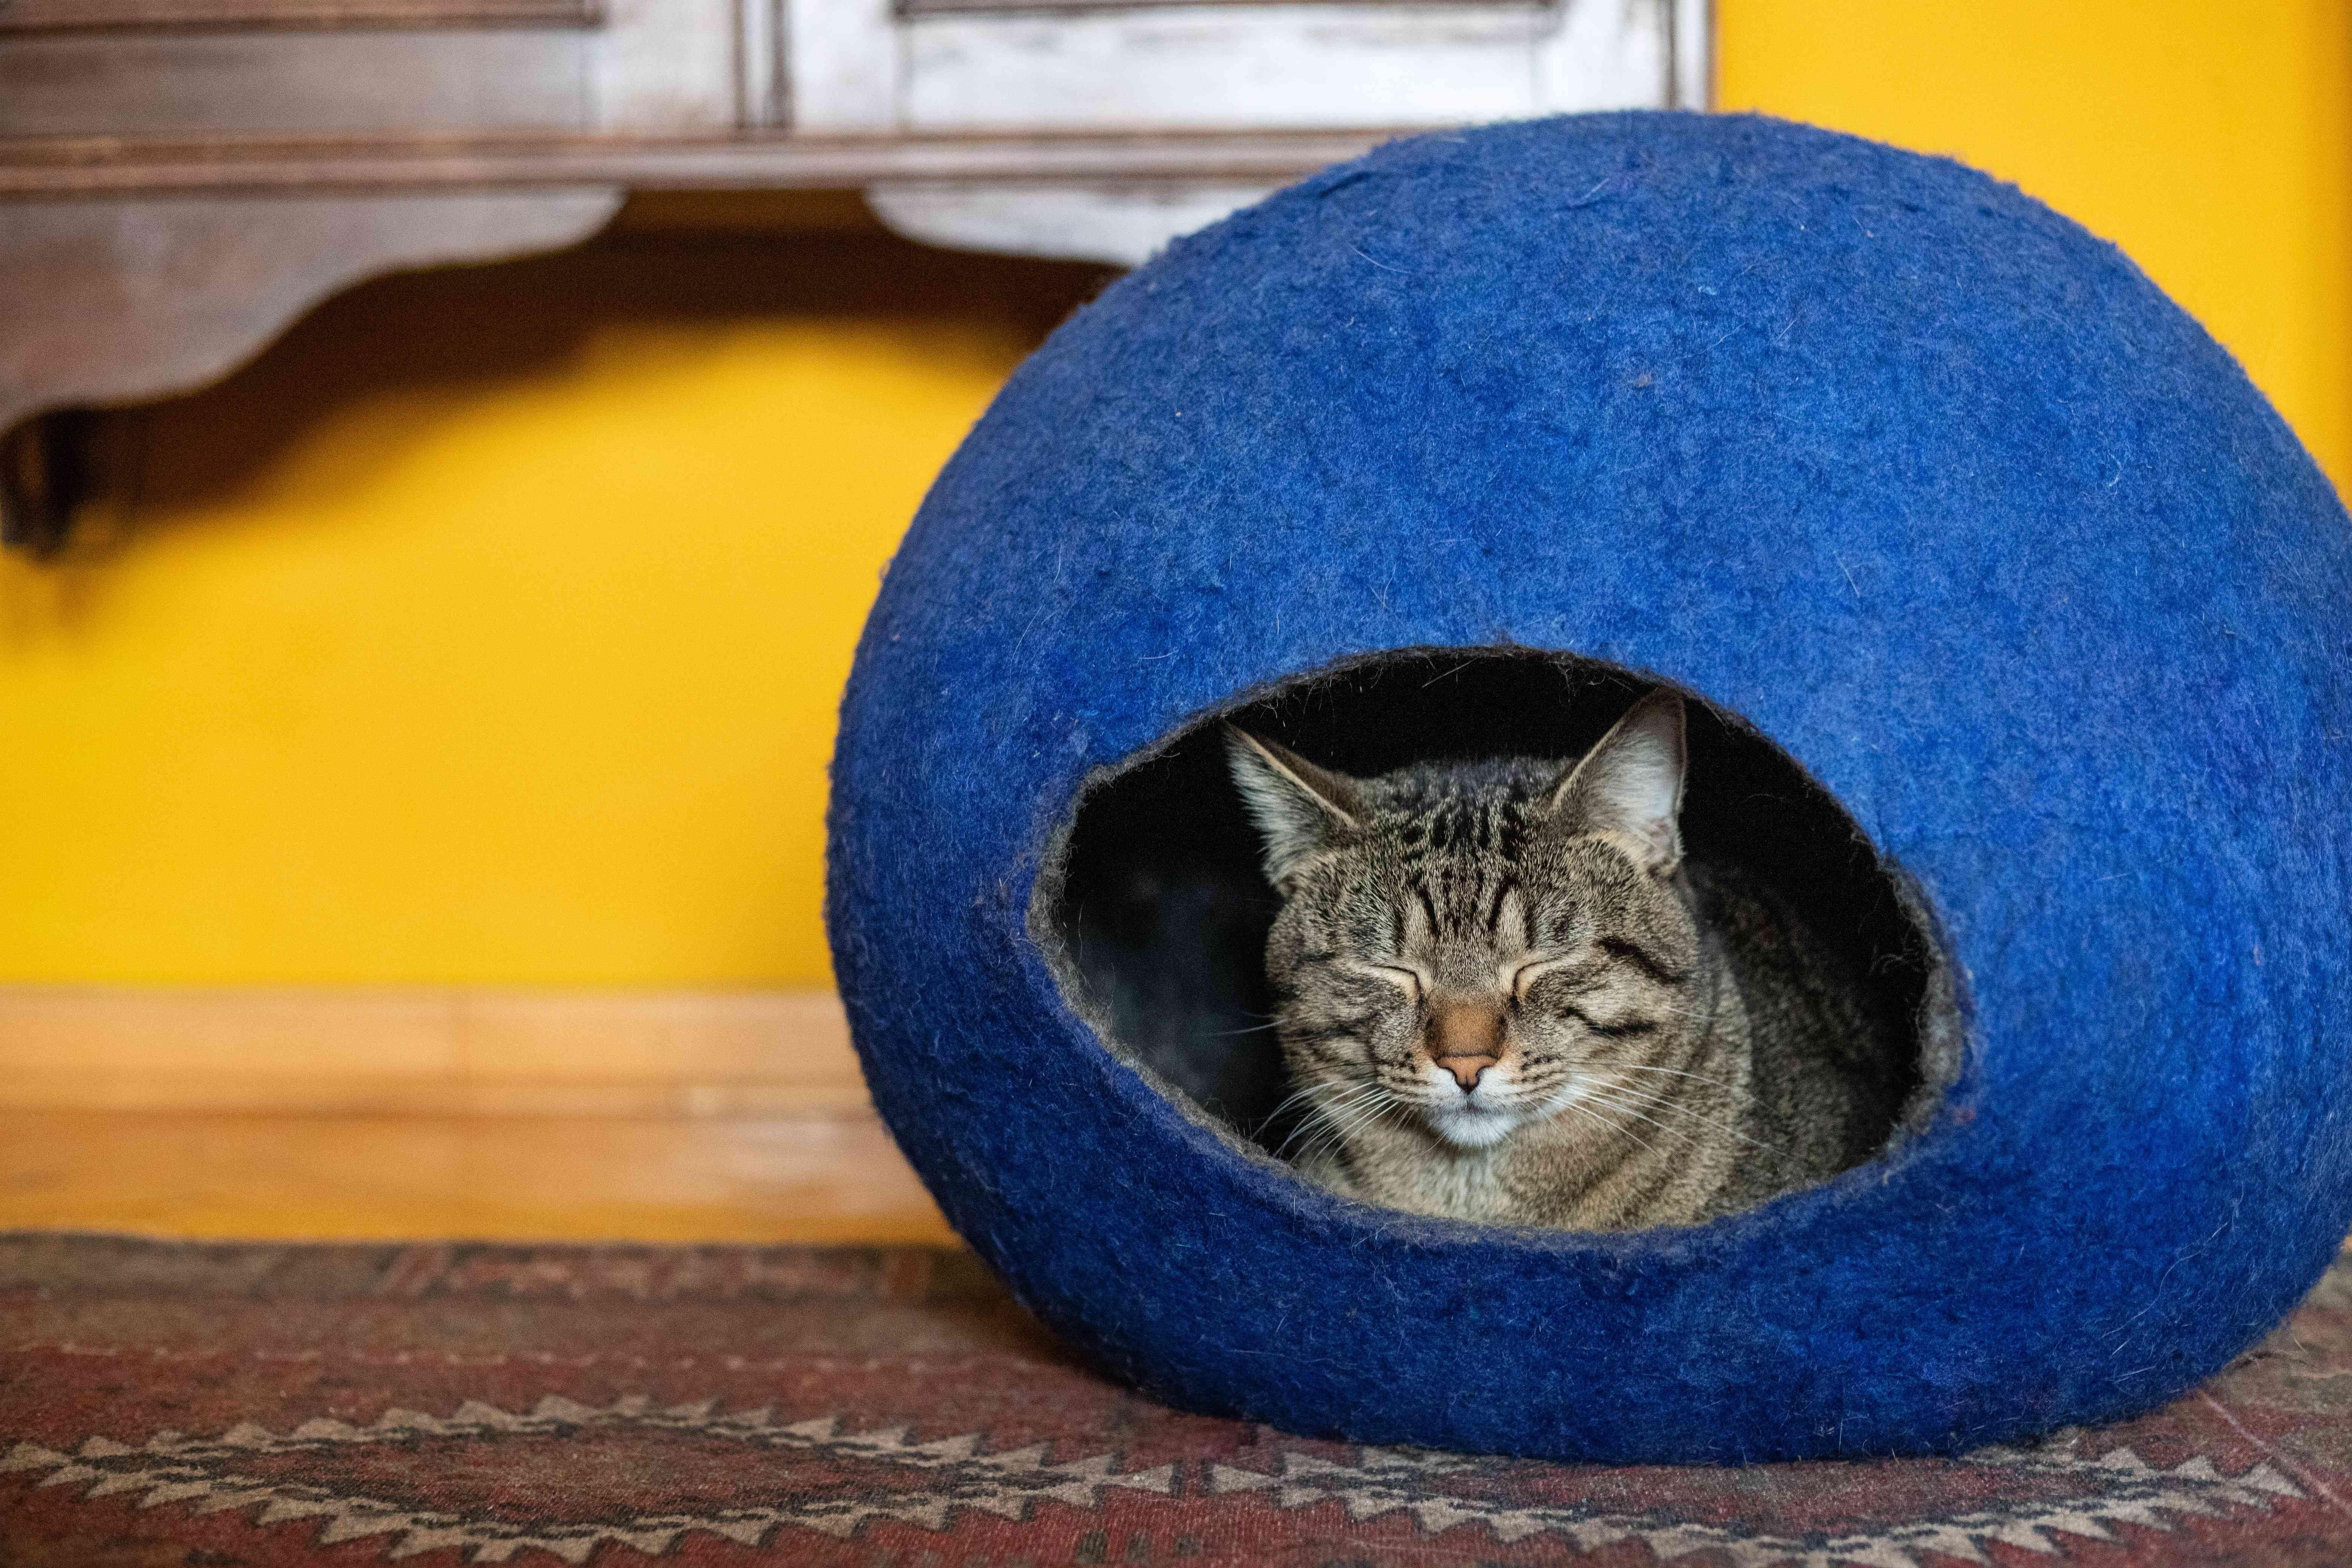 striped kitty sits cozy in blue felt globe house